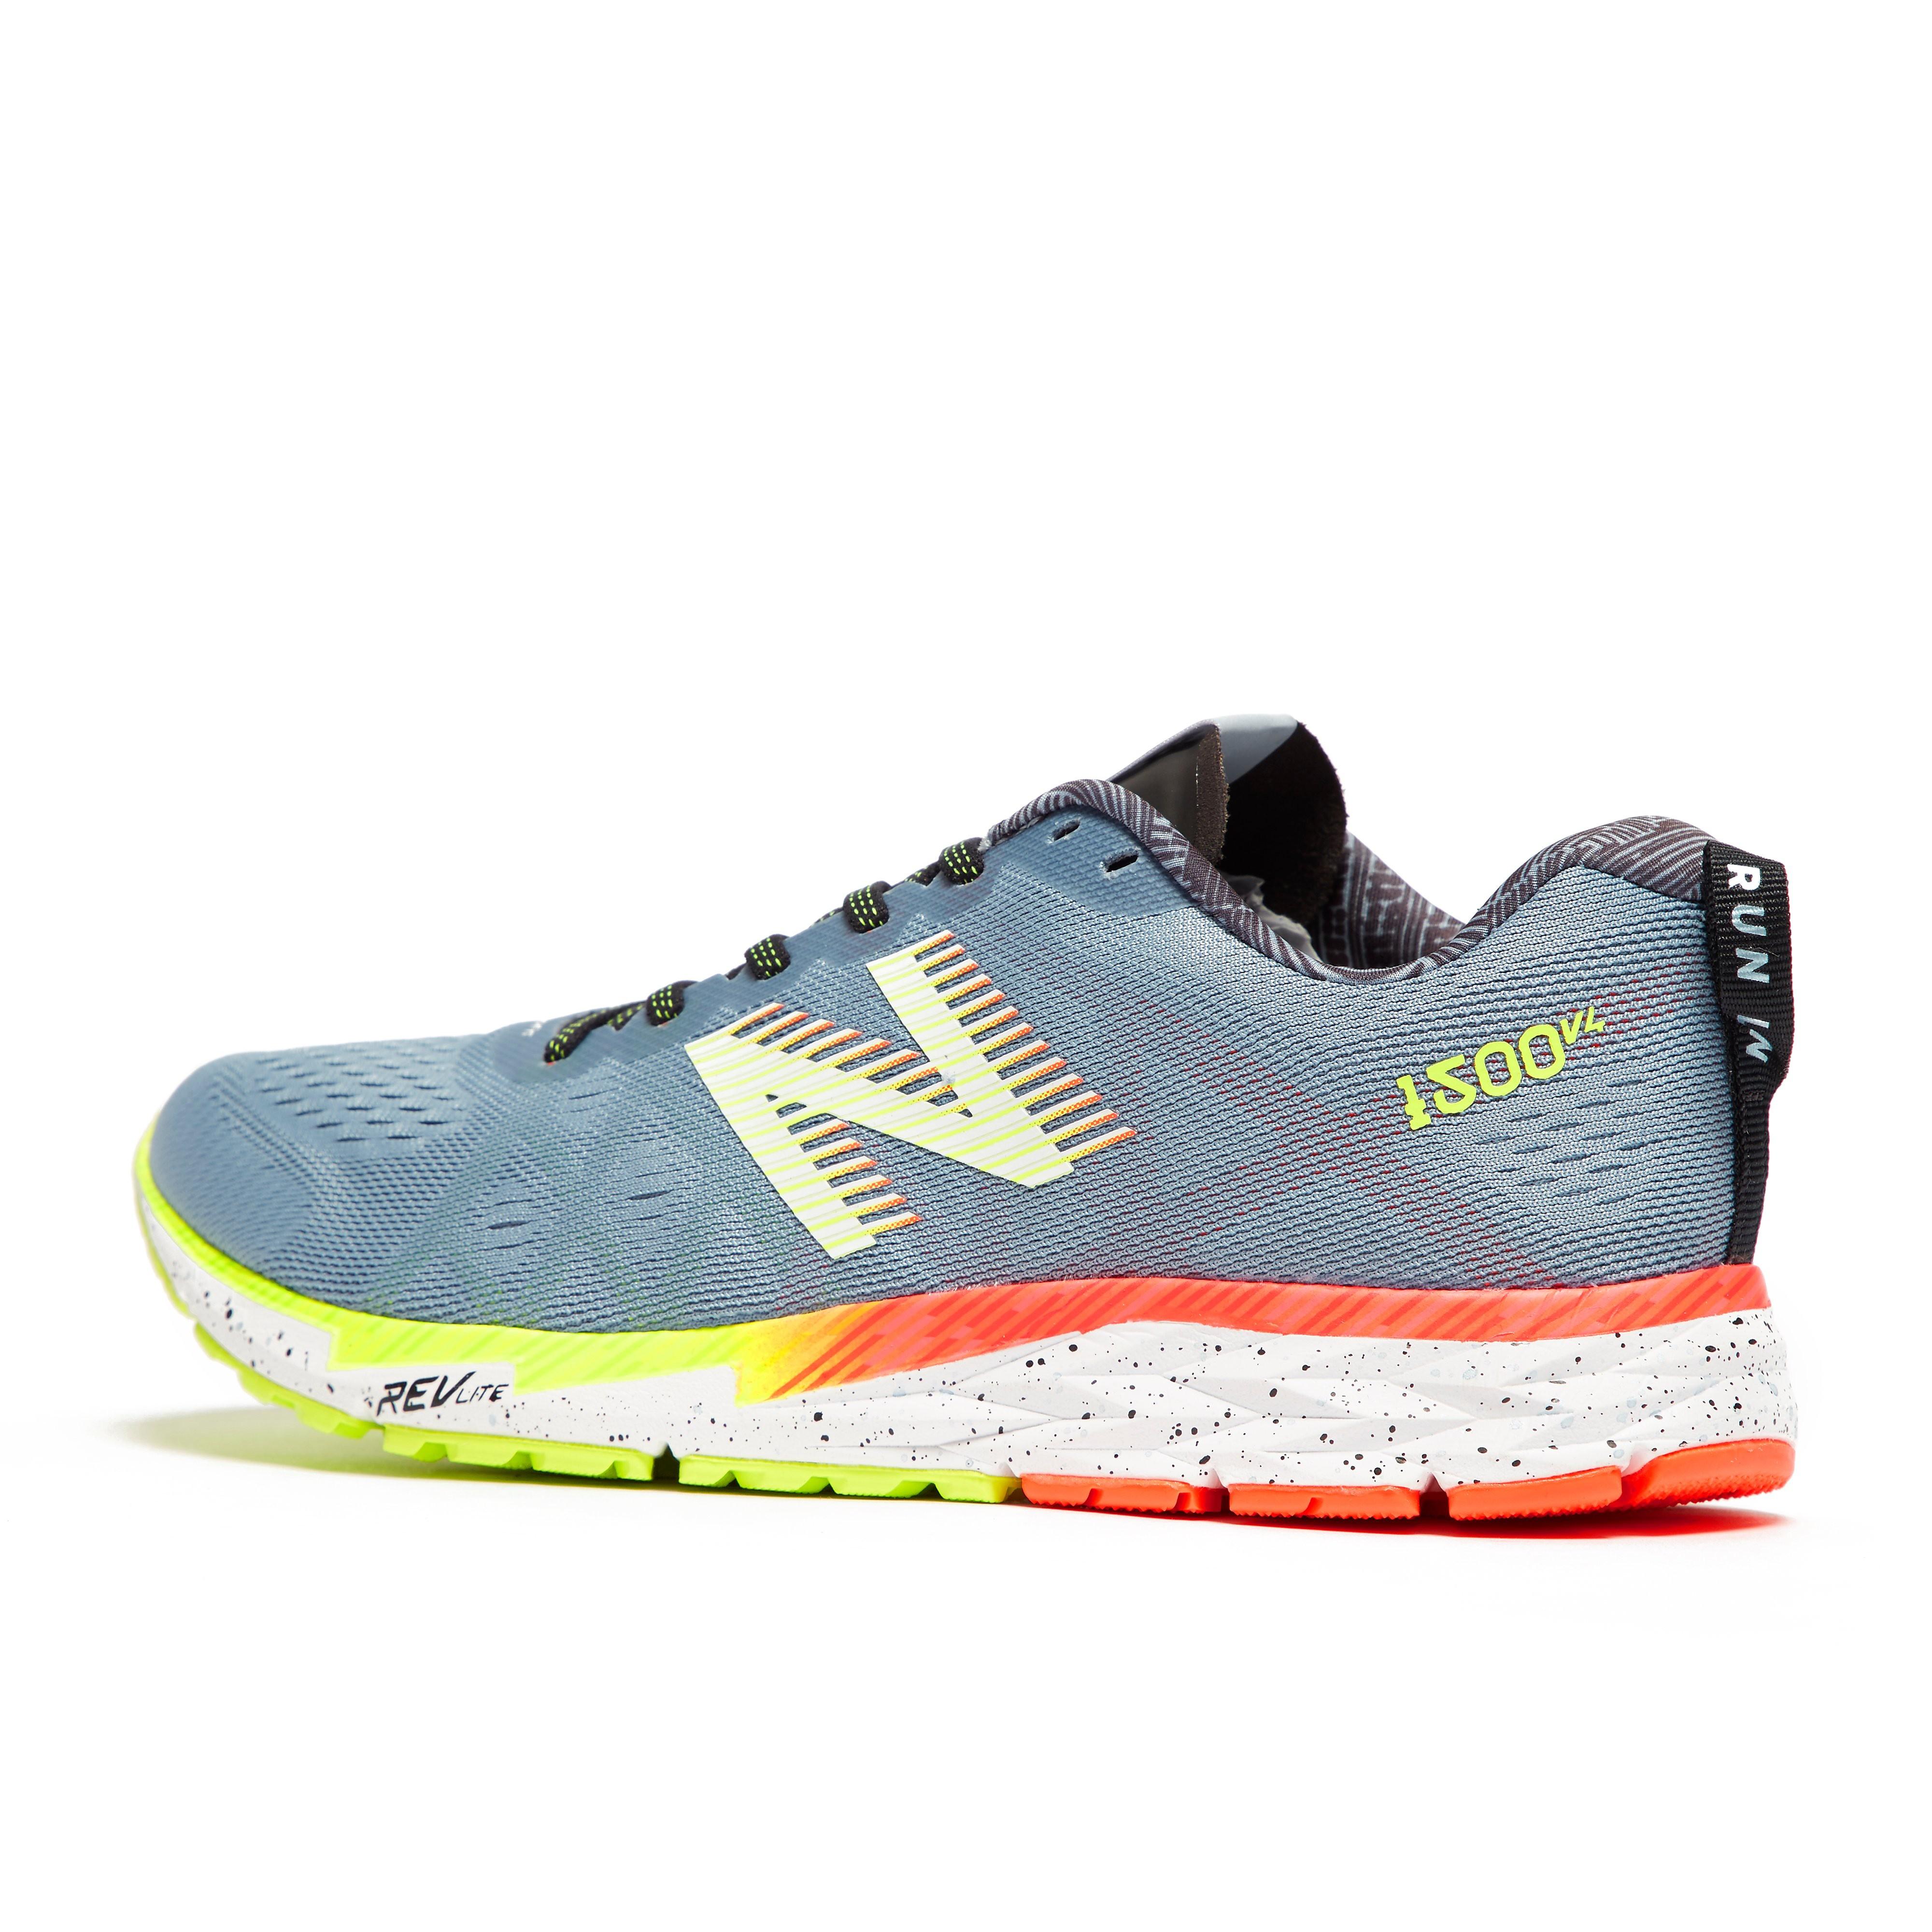 New Balance 1500V4 London Marathon Edition Men's Running Shoes